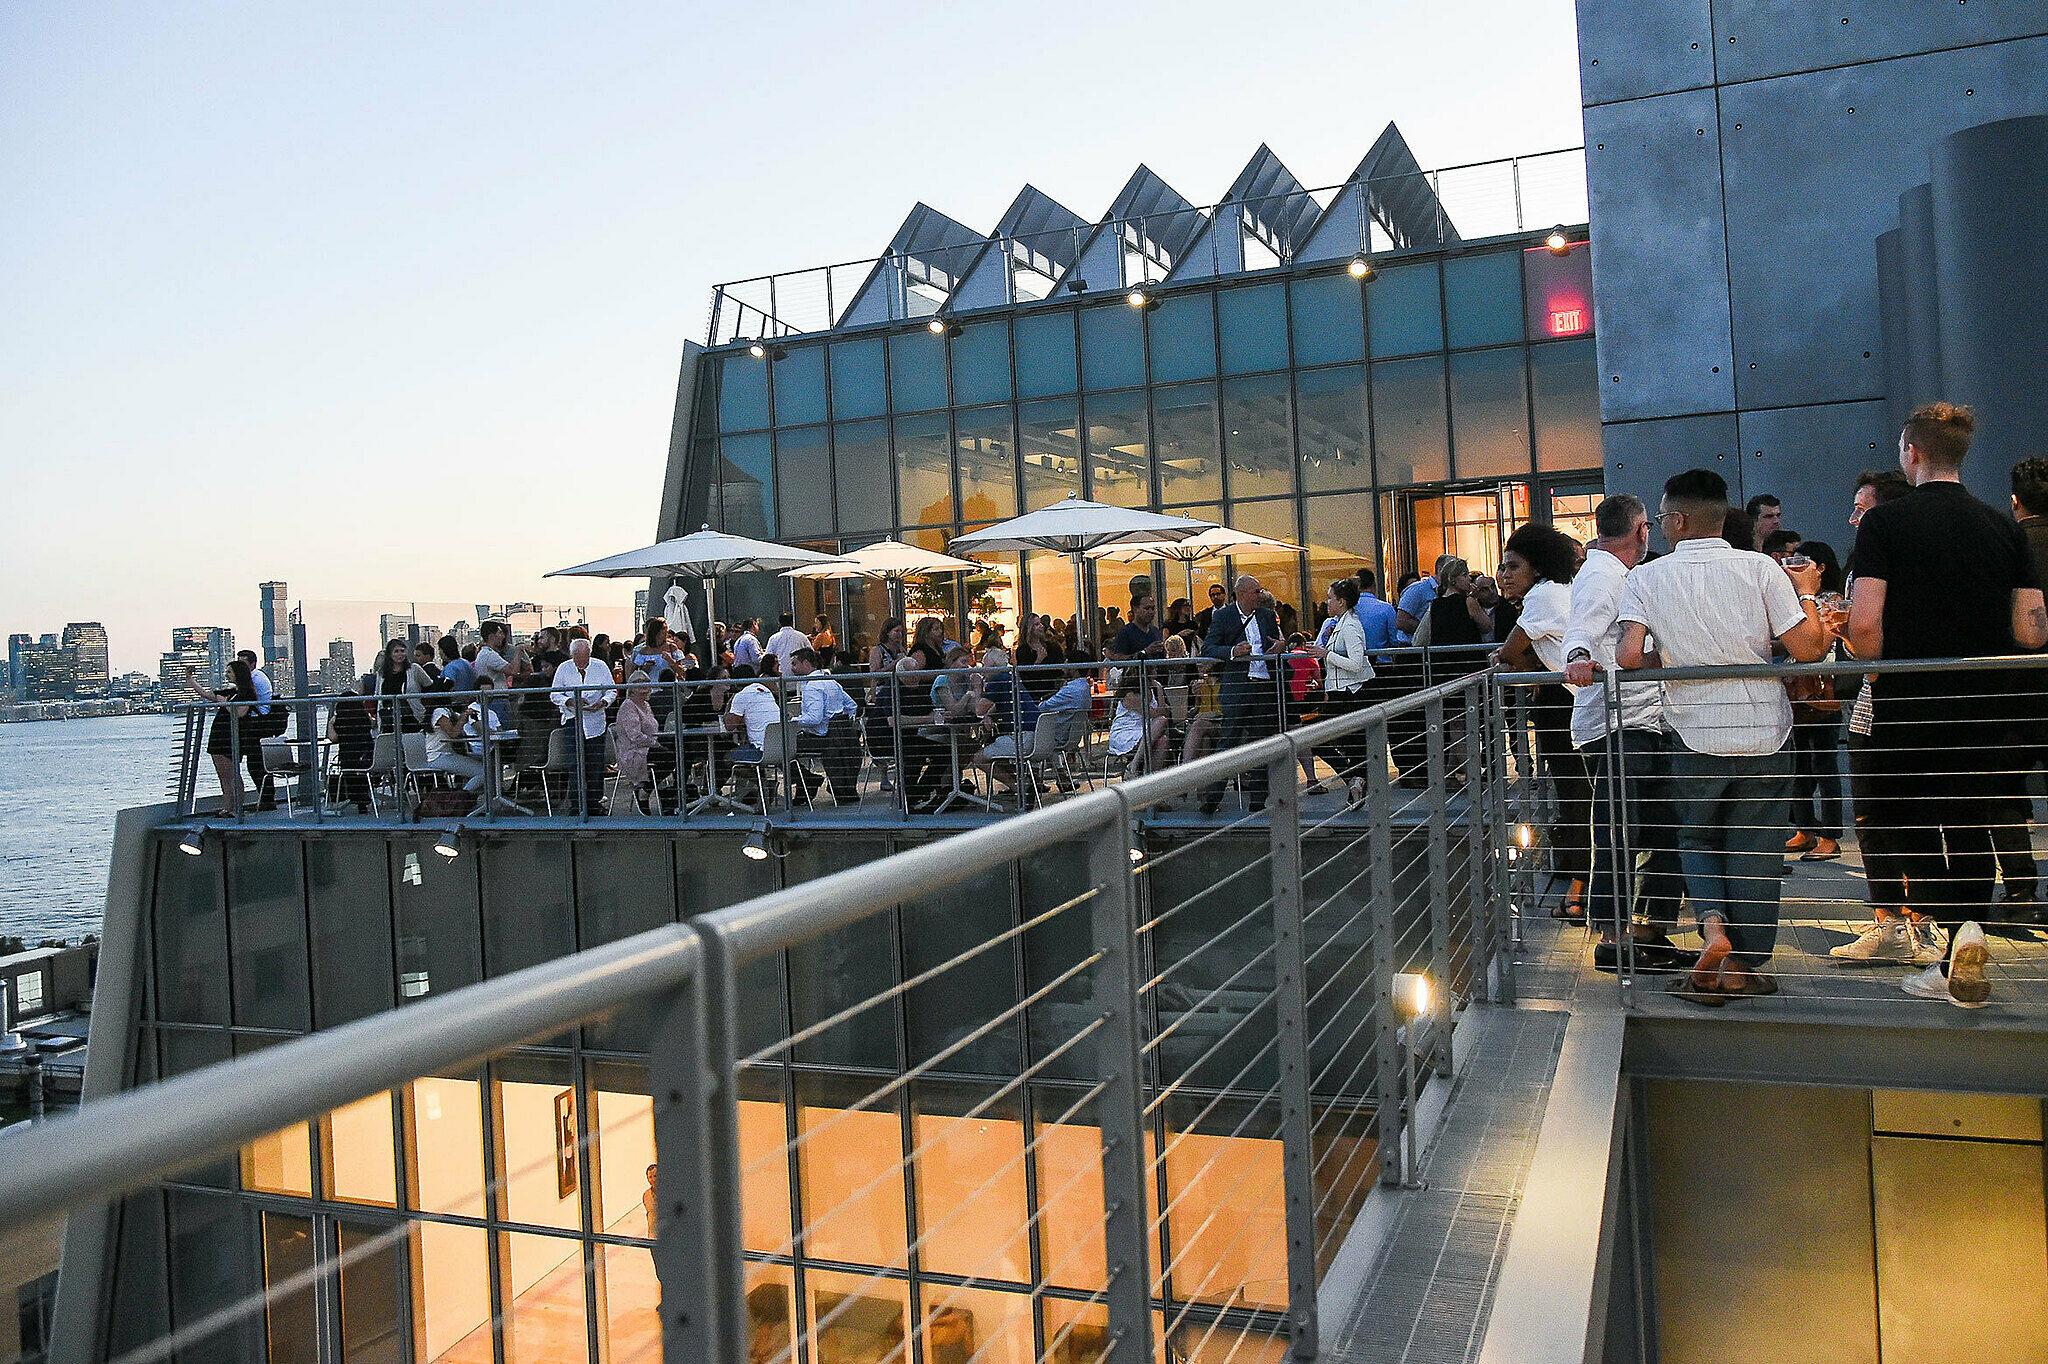 Members enjoy the Whitney Museum's terrace